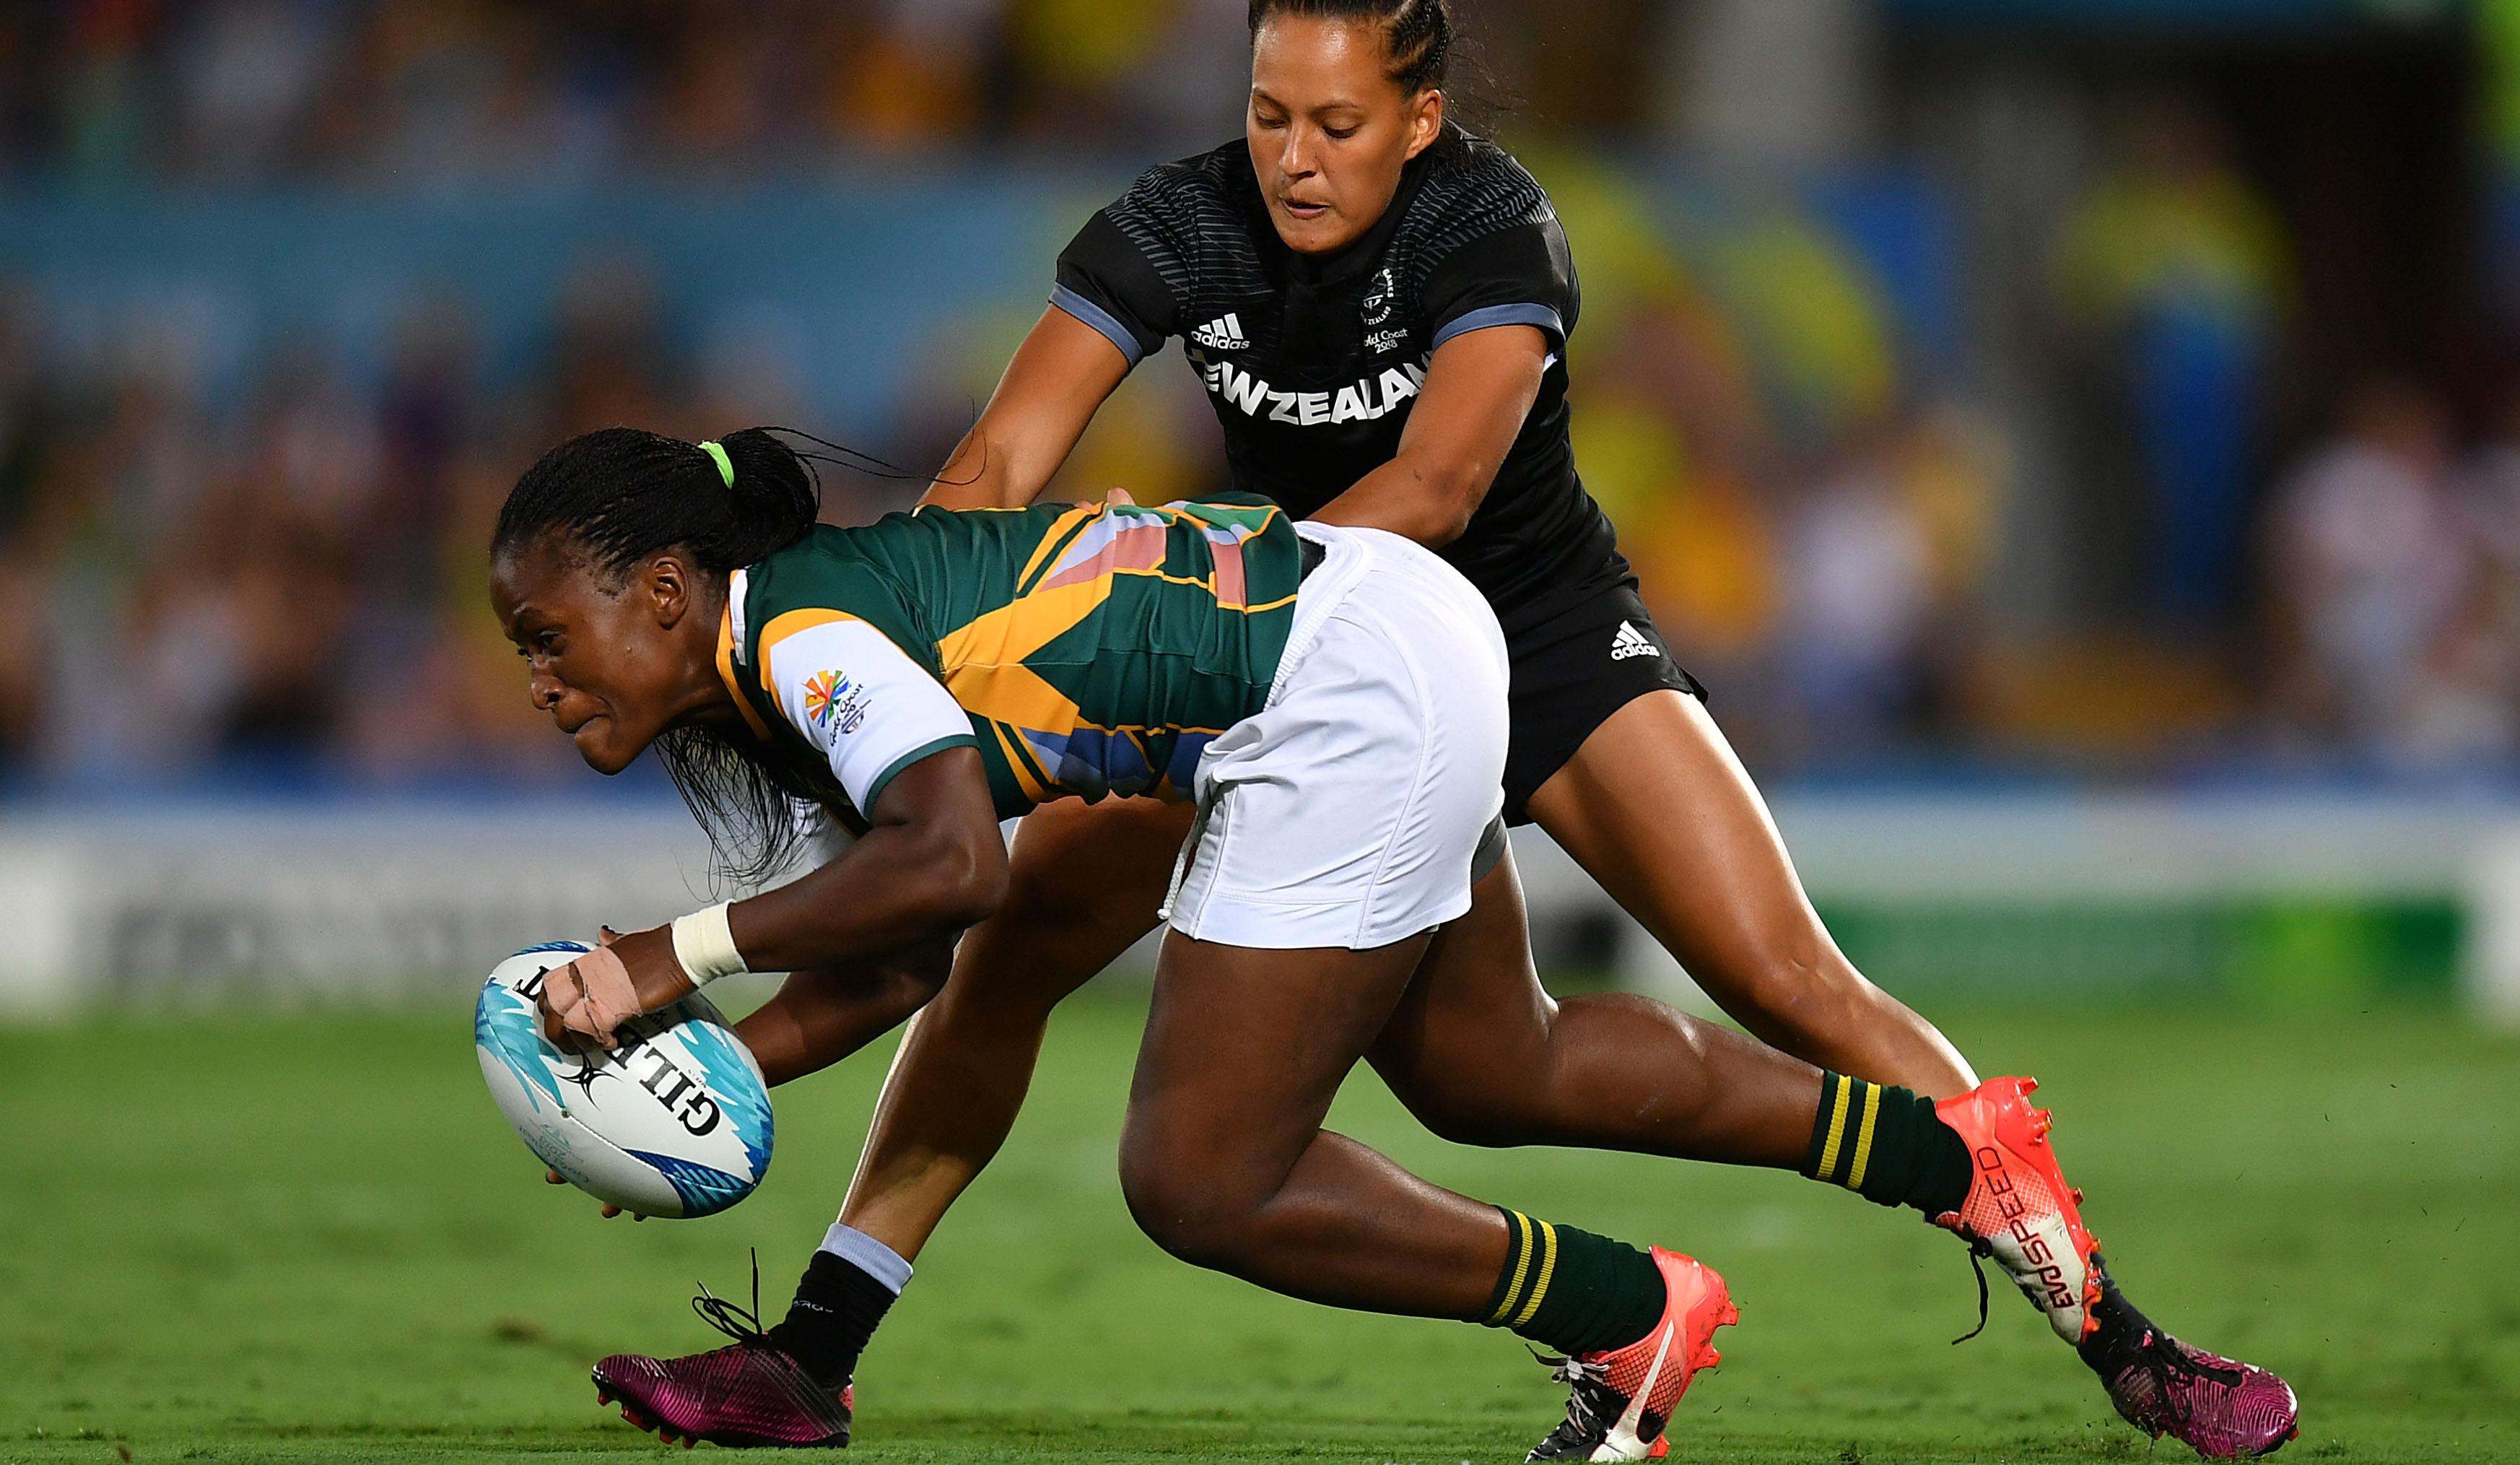 Imbokodo braced for historic Cape Town debut